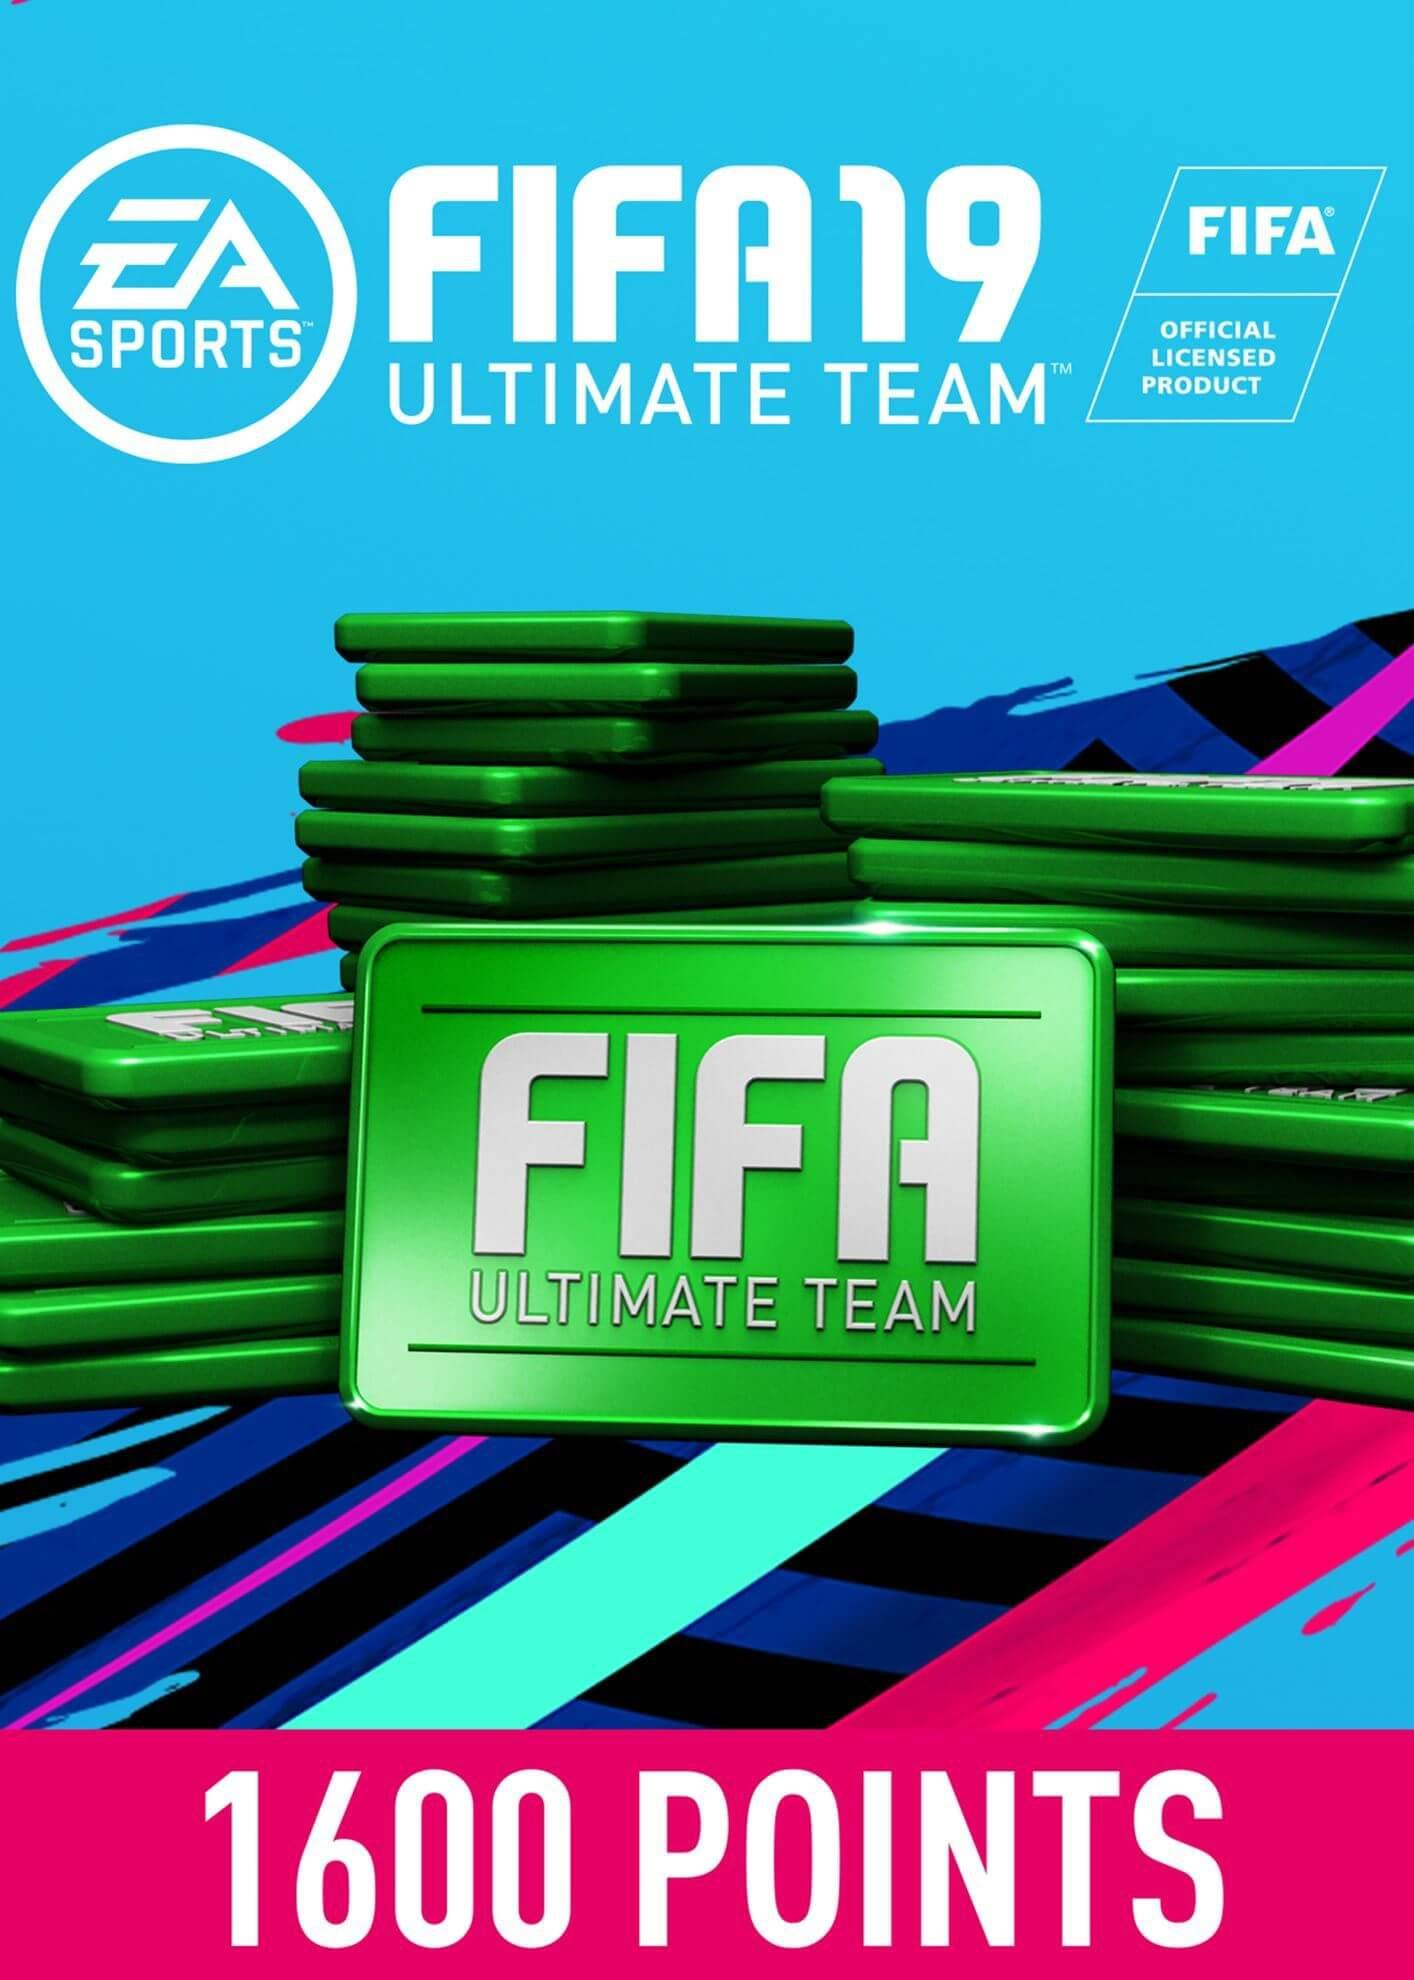 FIFA 19 ULTIMATE TEAM FIFA POINTS 1600